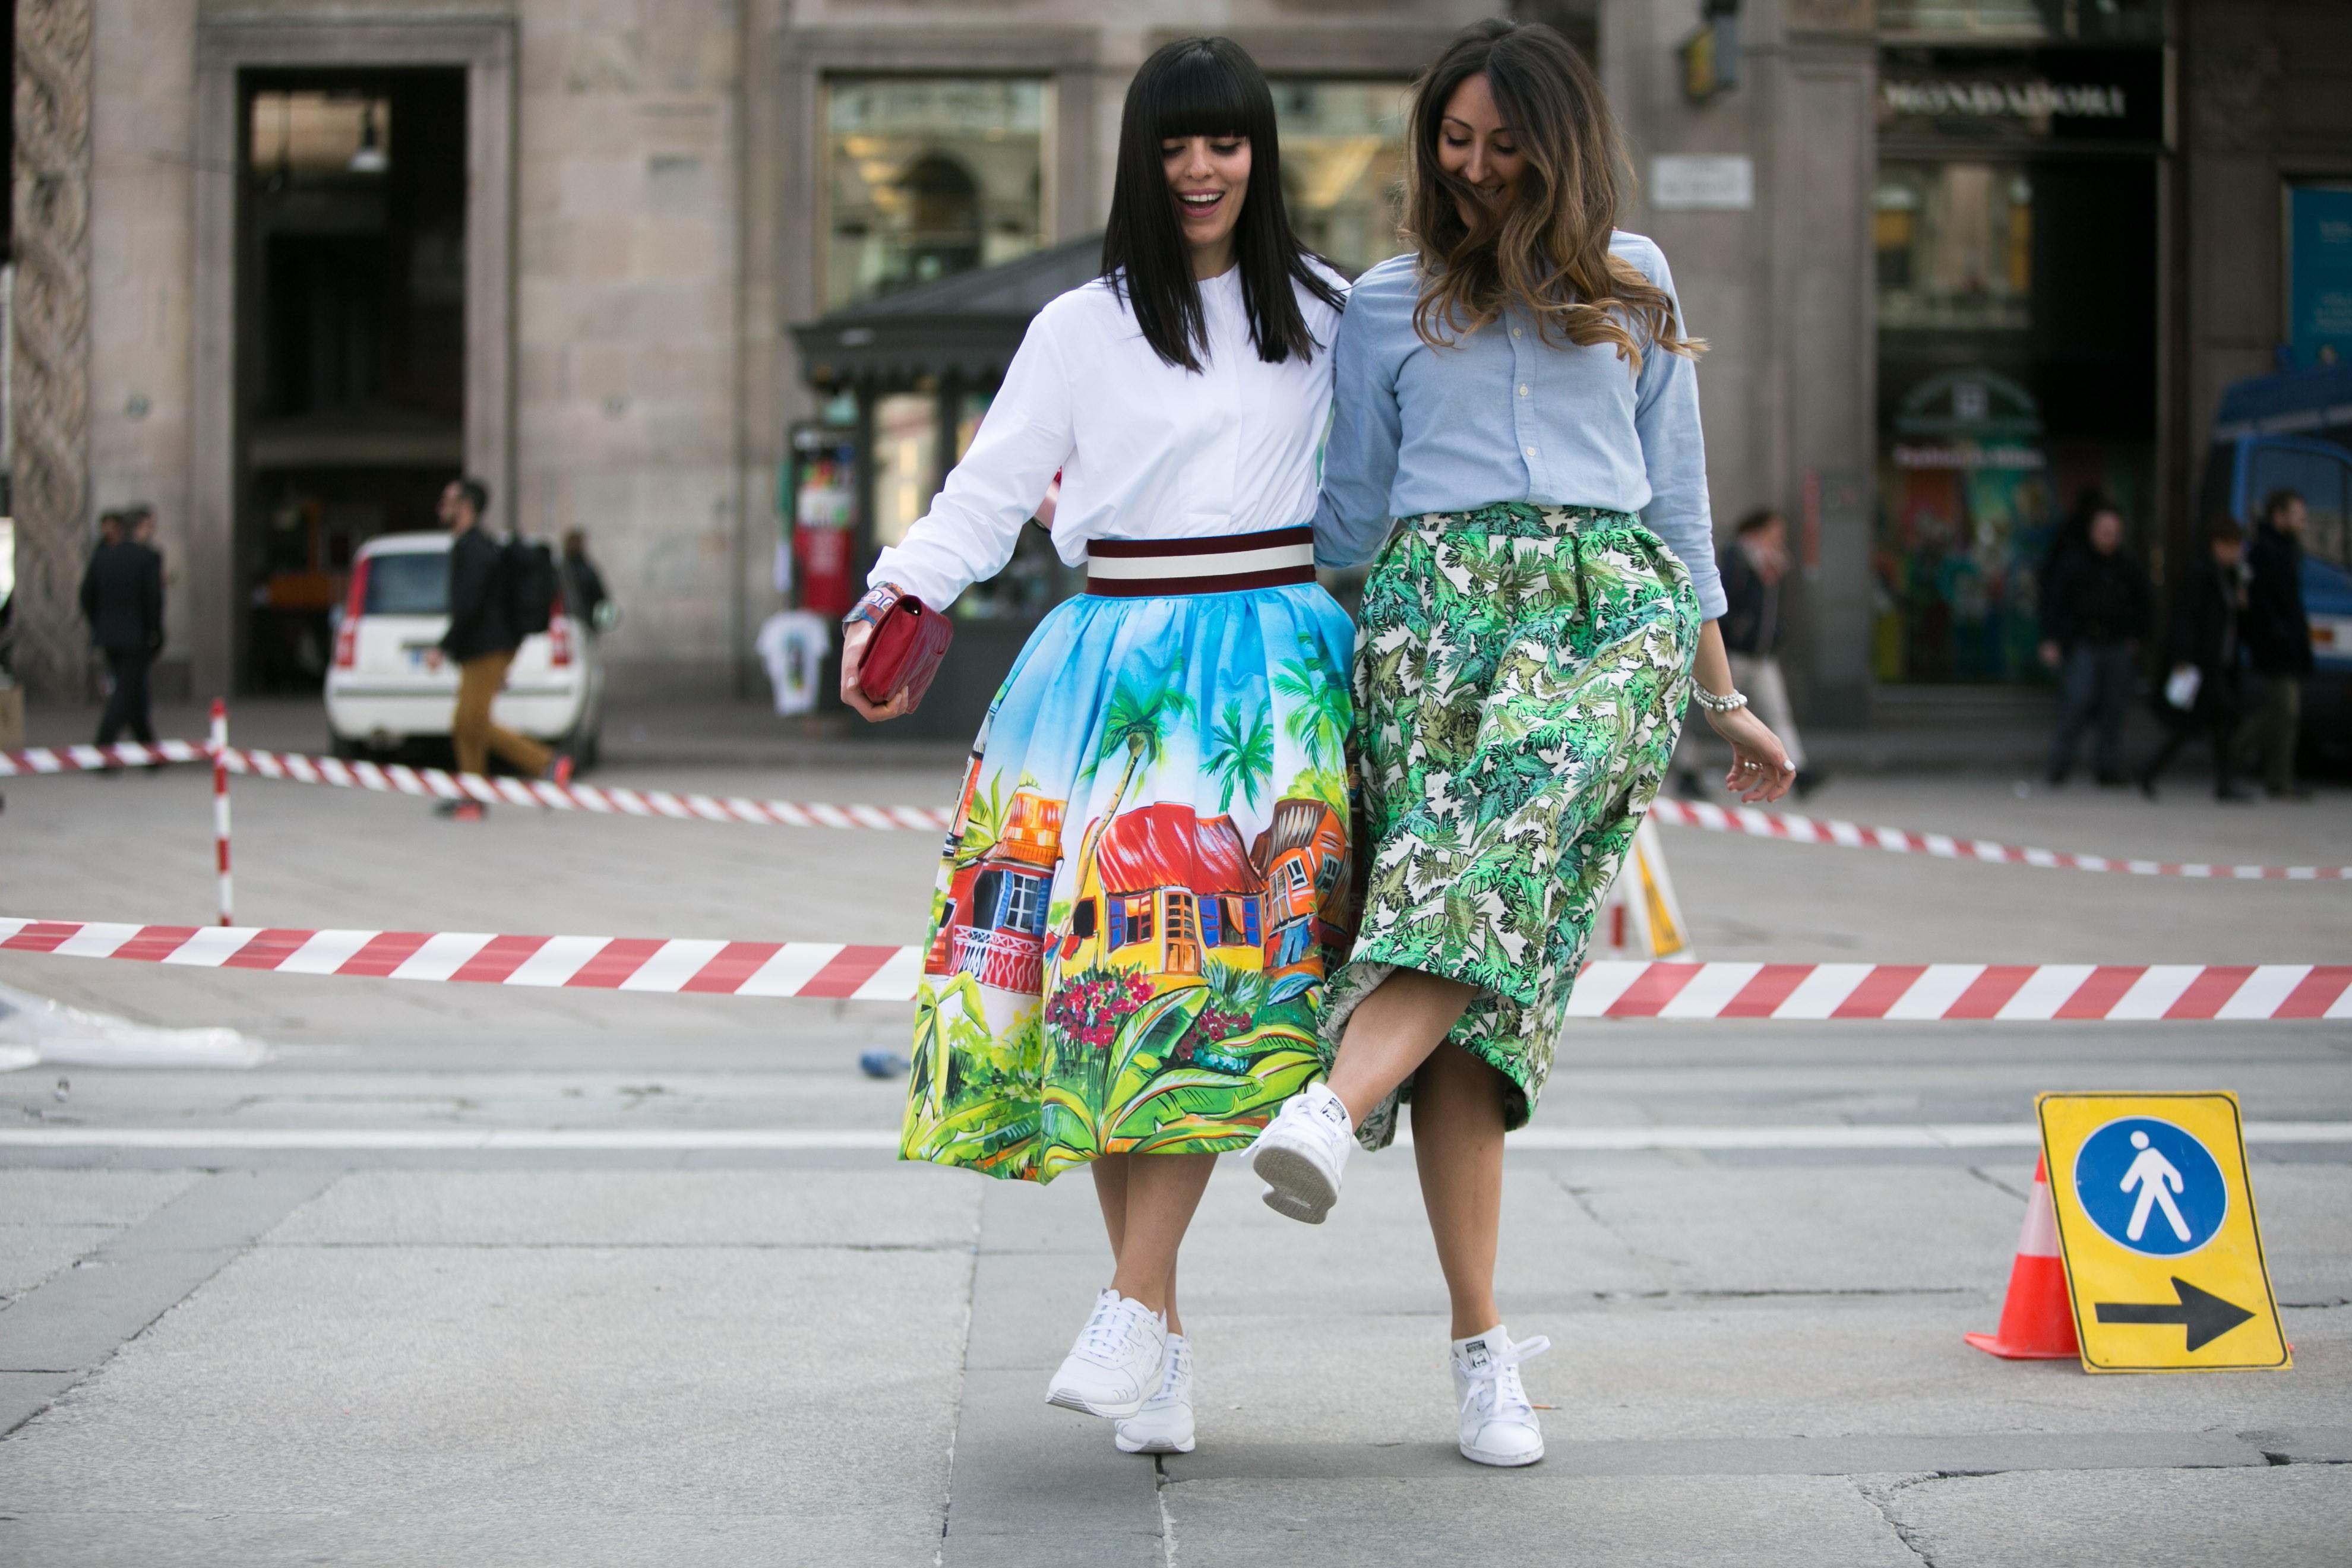 Vogue.globo - Adriano Cisani - Stella Jean - Matchy Matchy - Midi Skirt - Milan Fashion Week - Milano Moda Donna